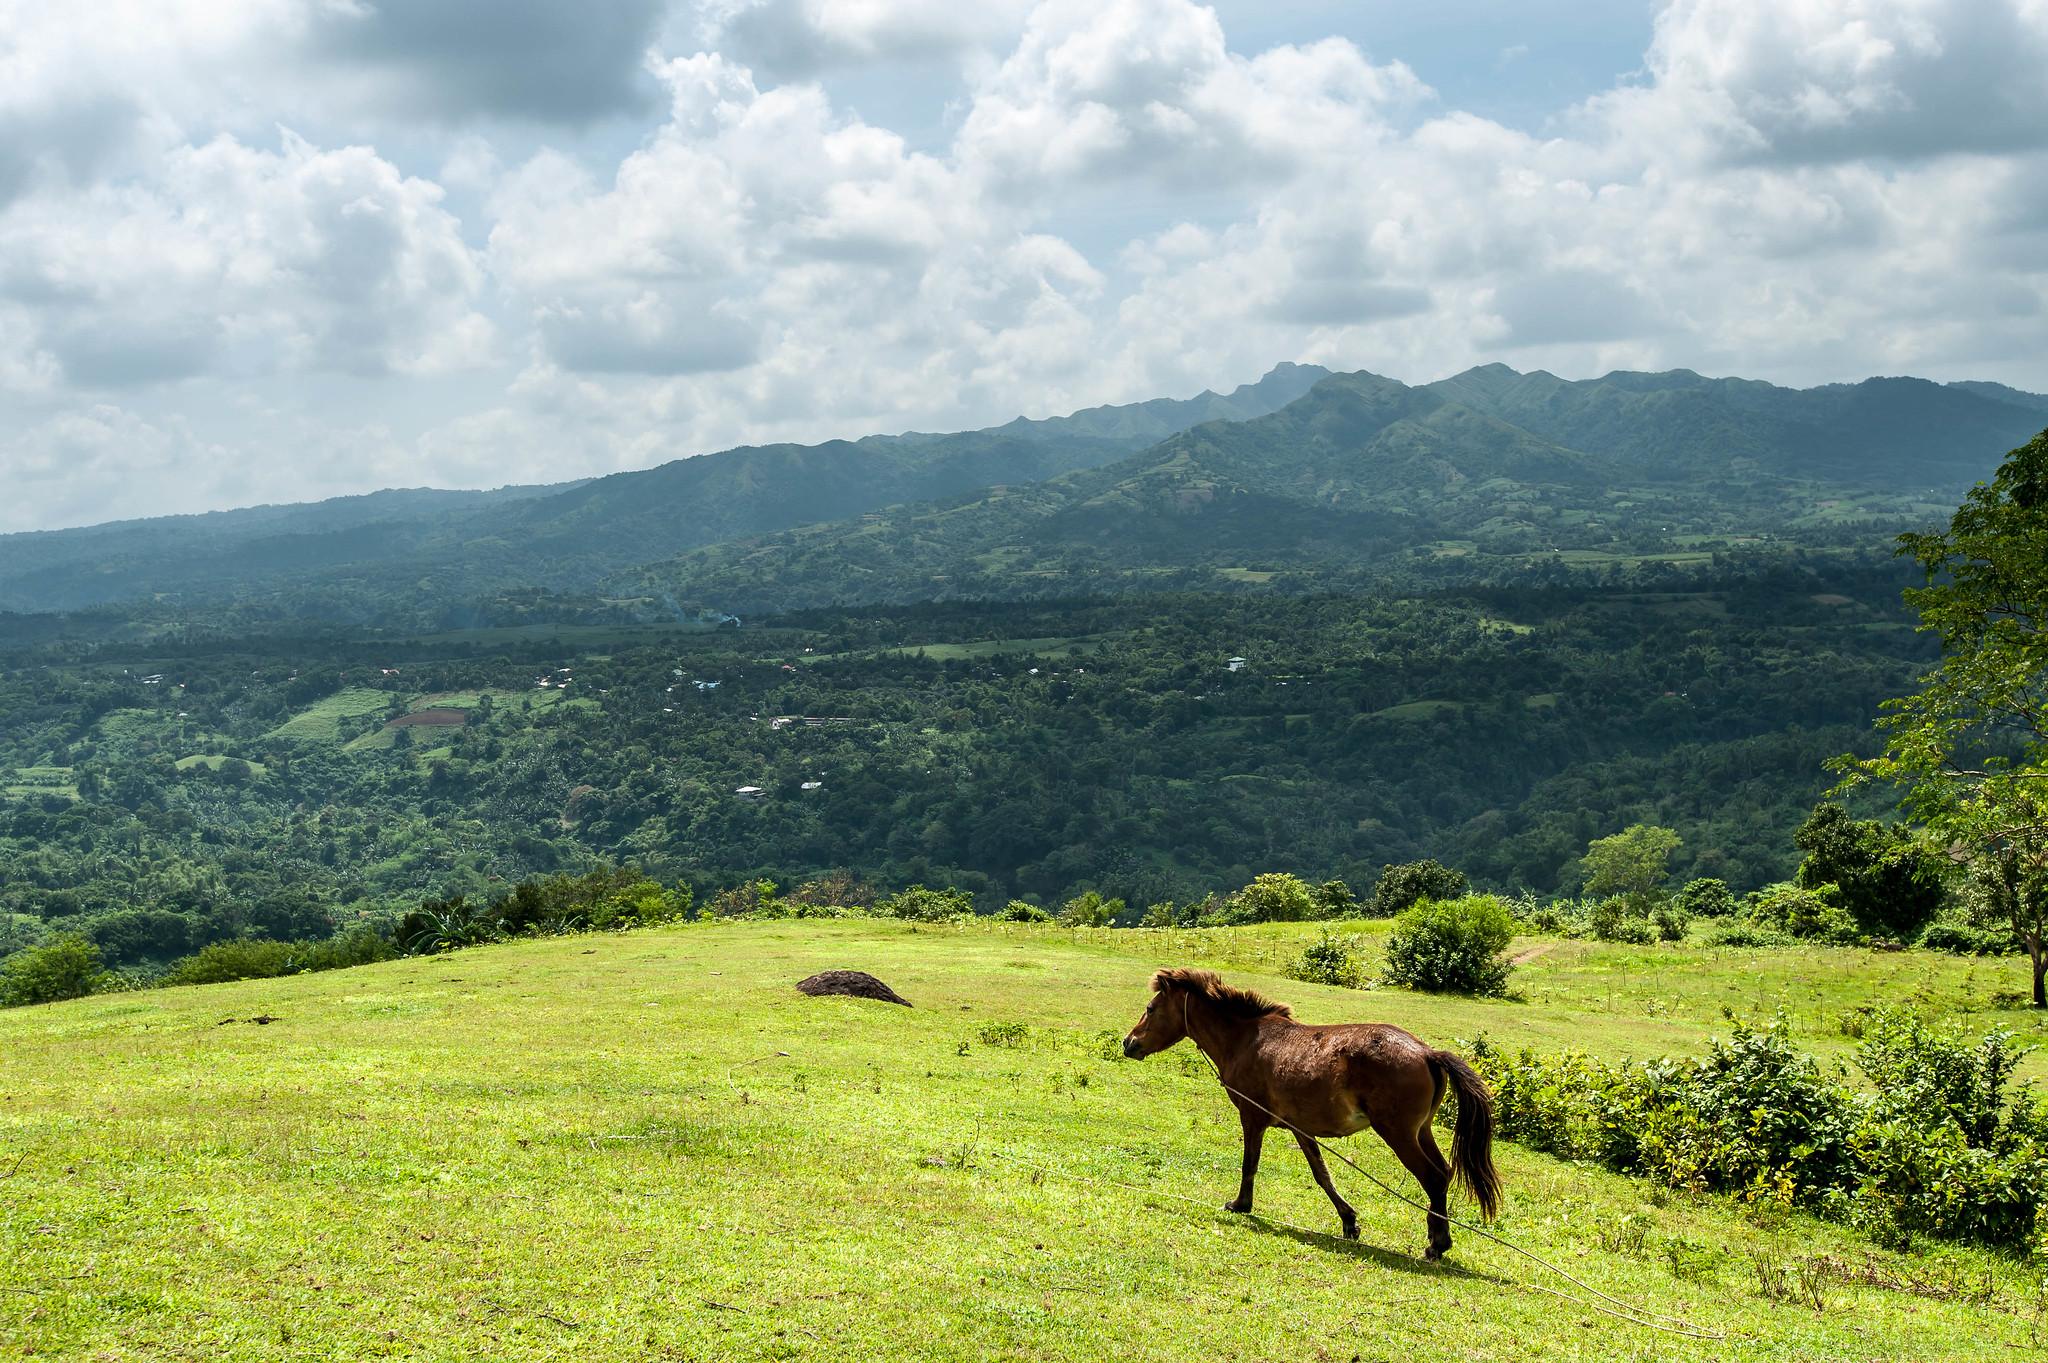 Travel Guide to Mt. Talamitam, Nasugbu, Laguna, Philippines